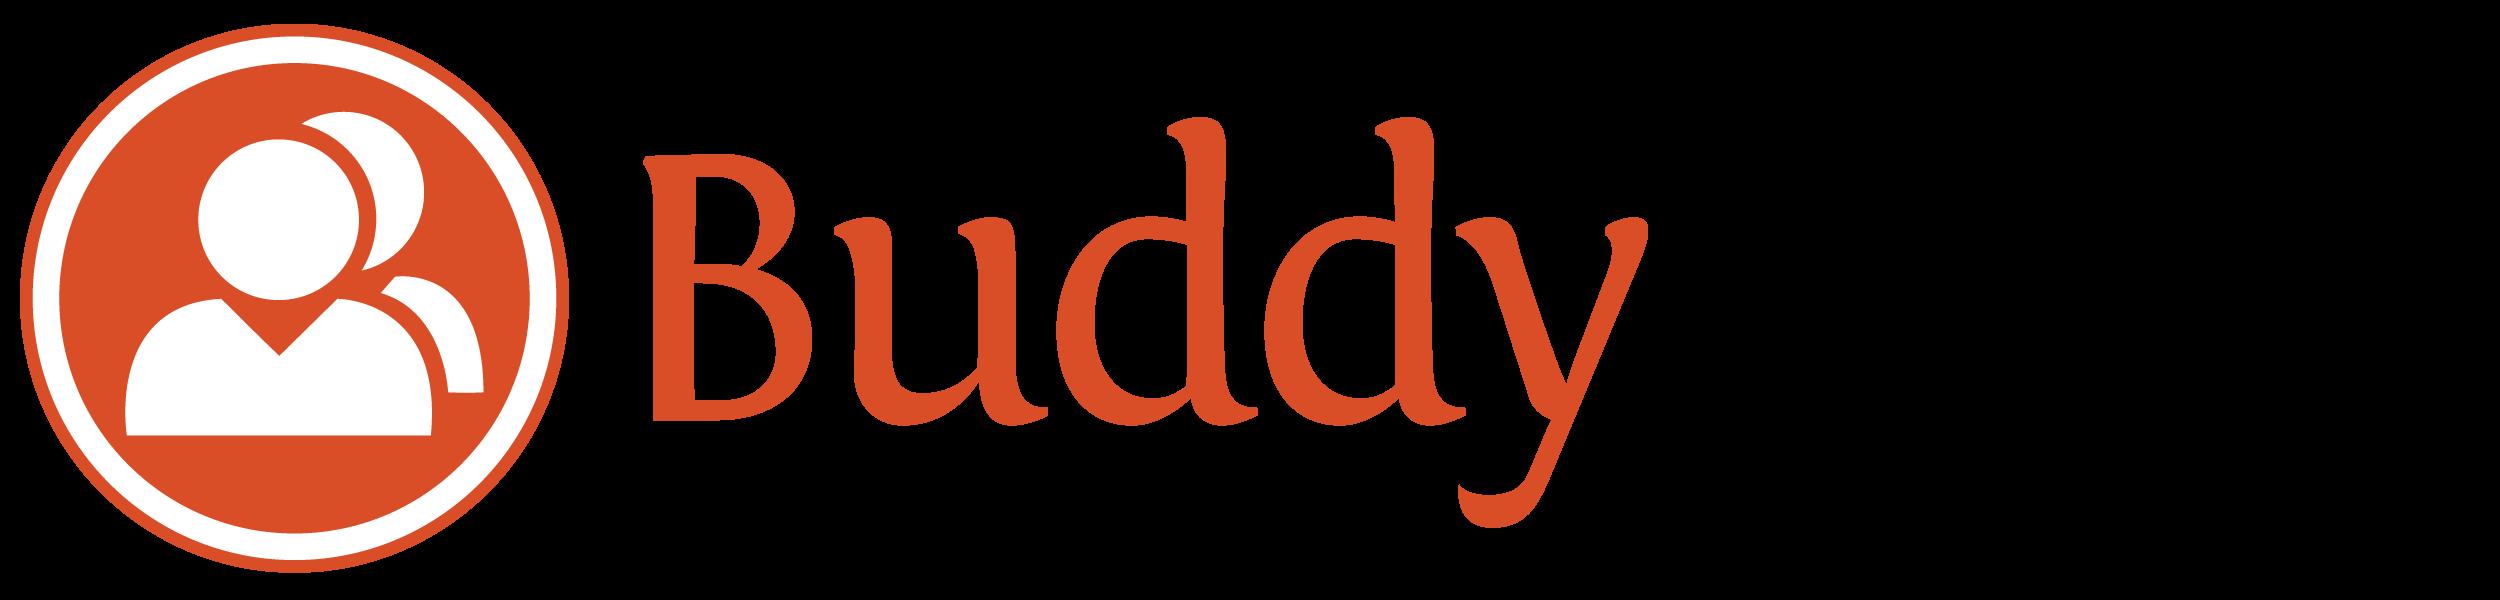 buddypress_logo.png